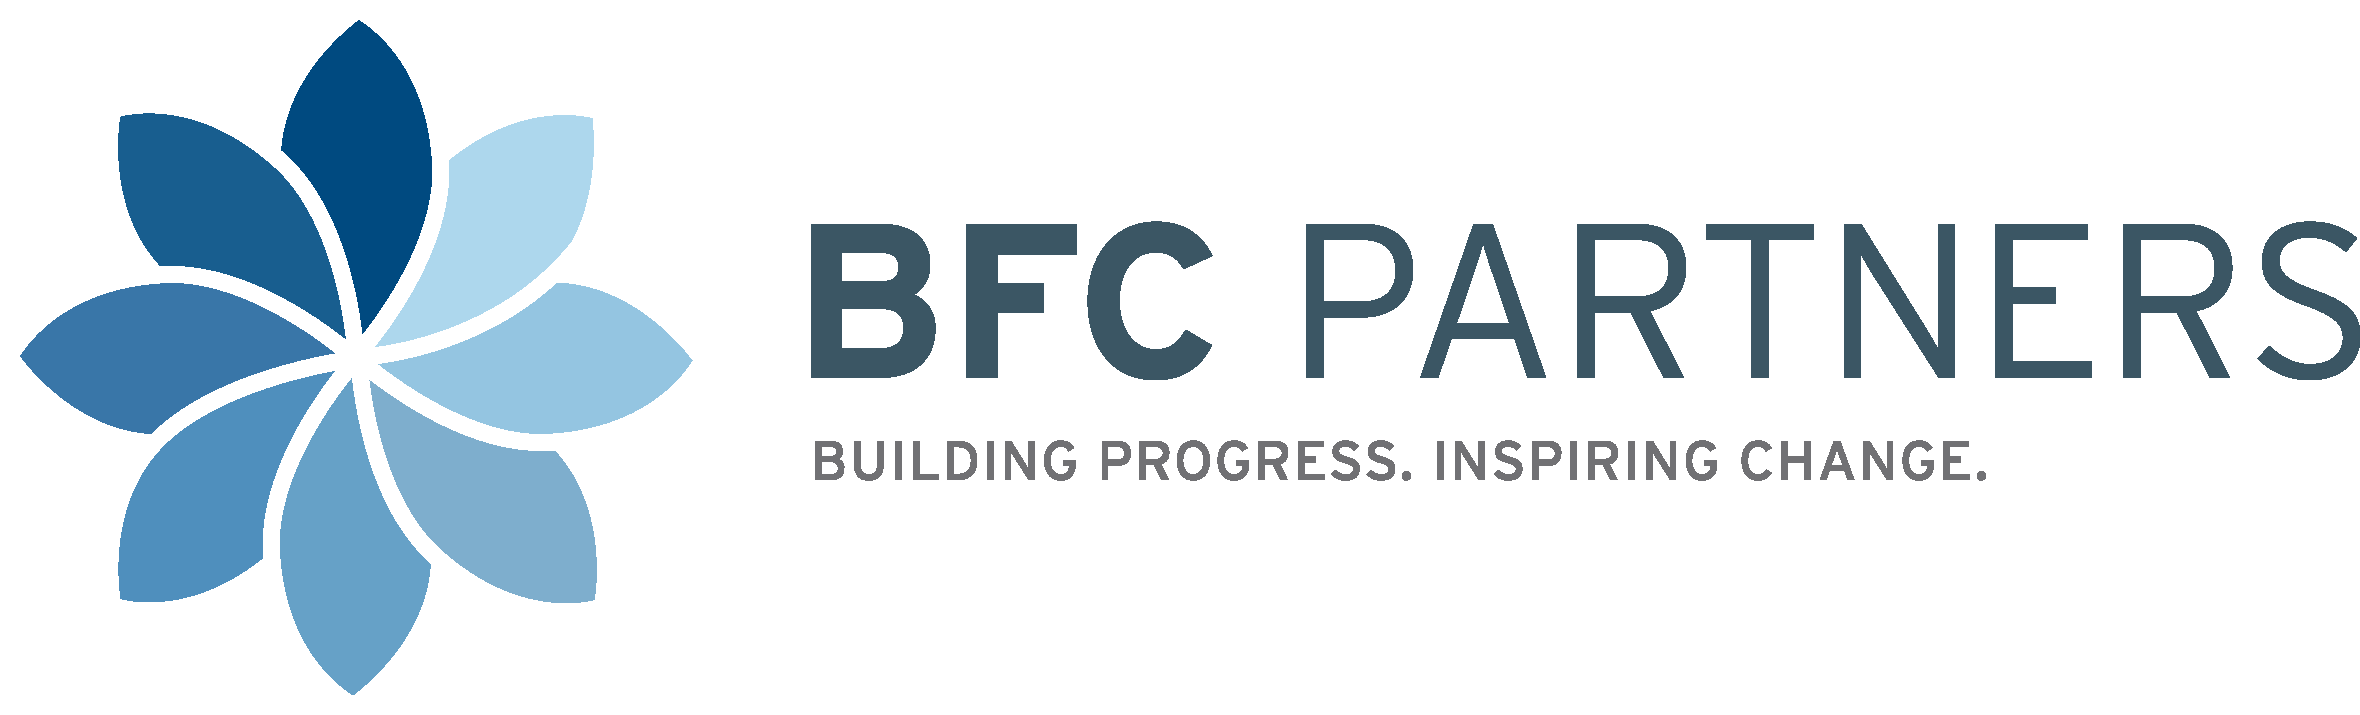 BFC Partners logo